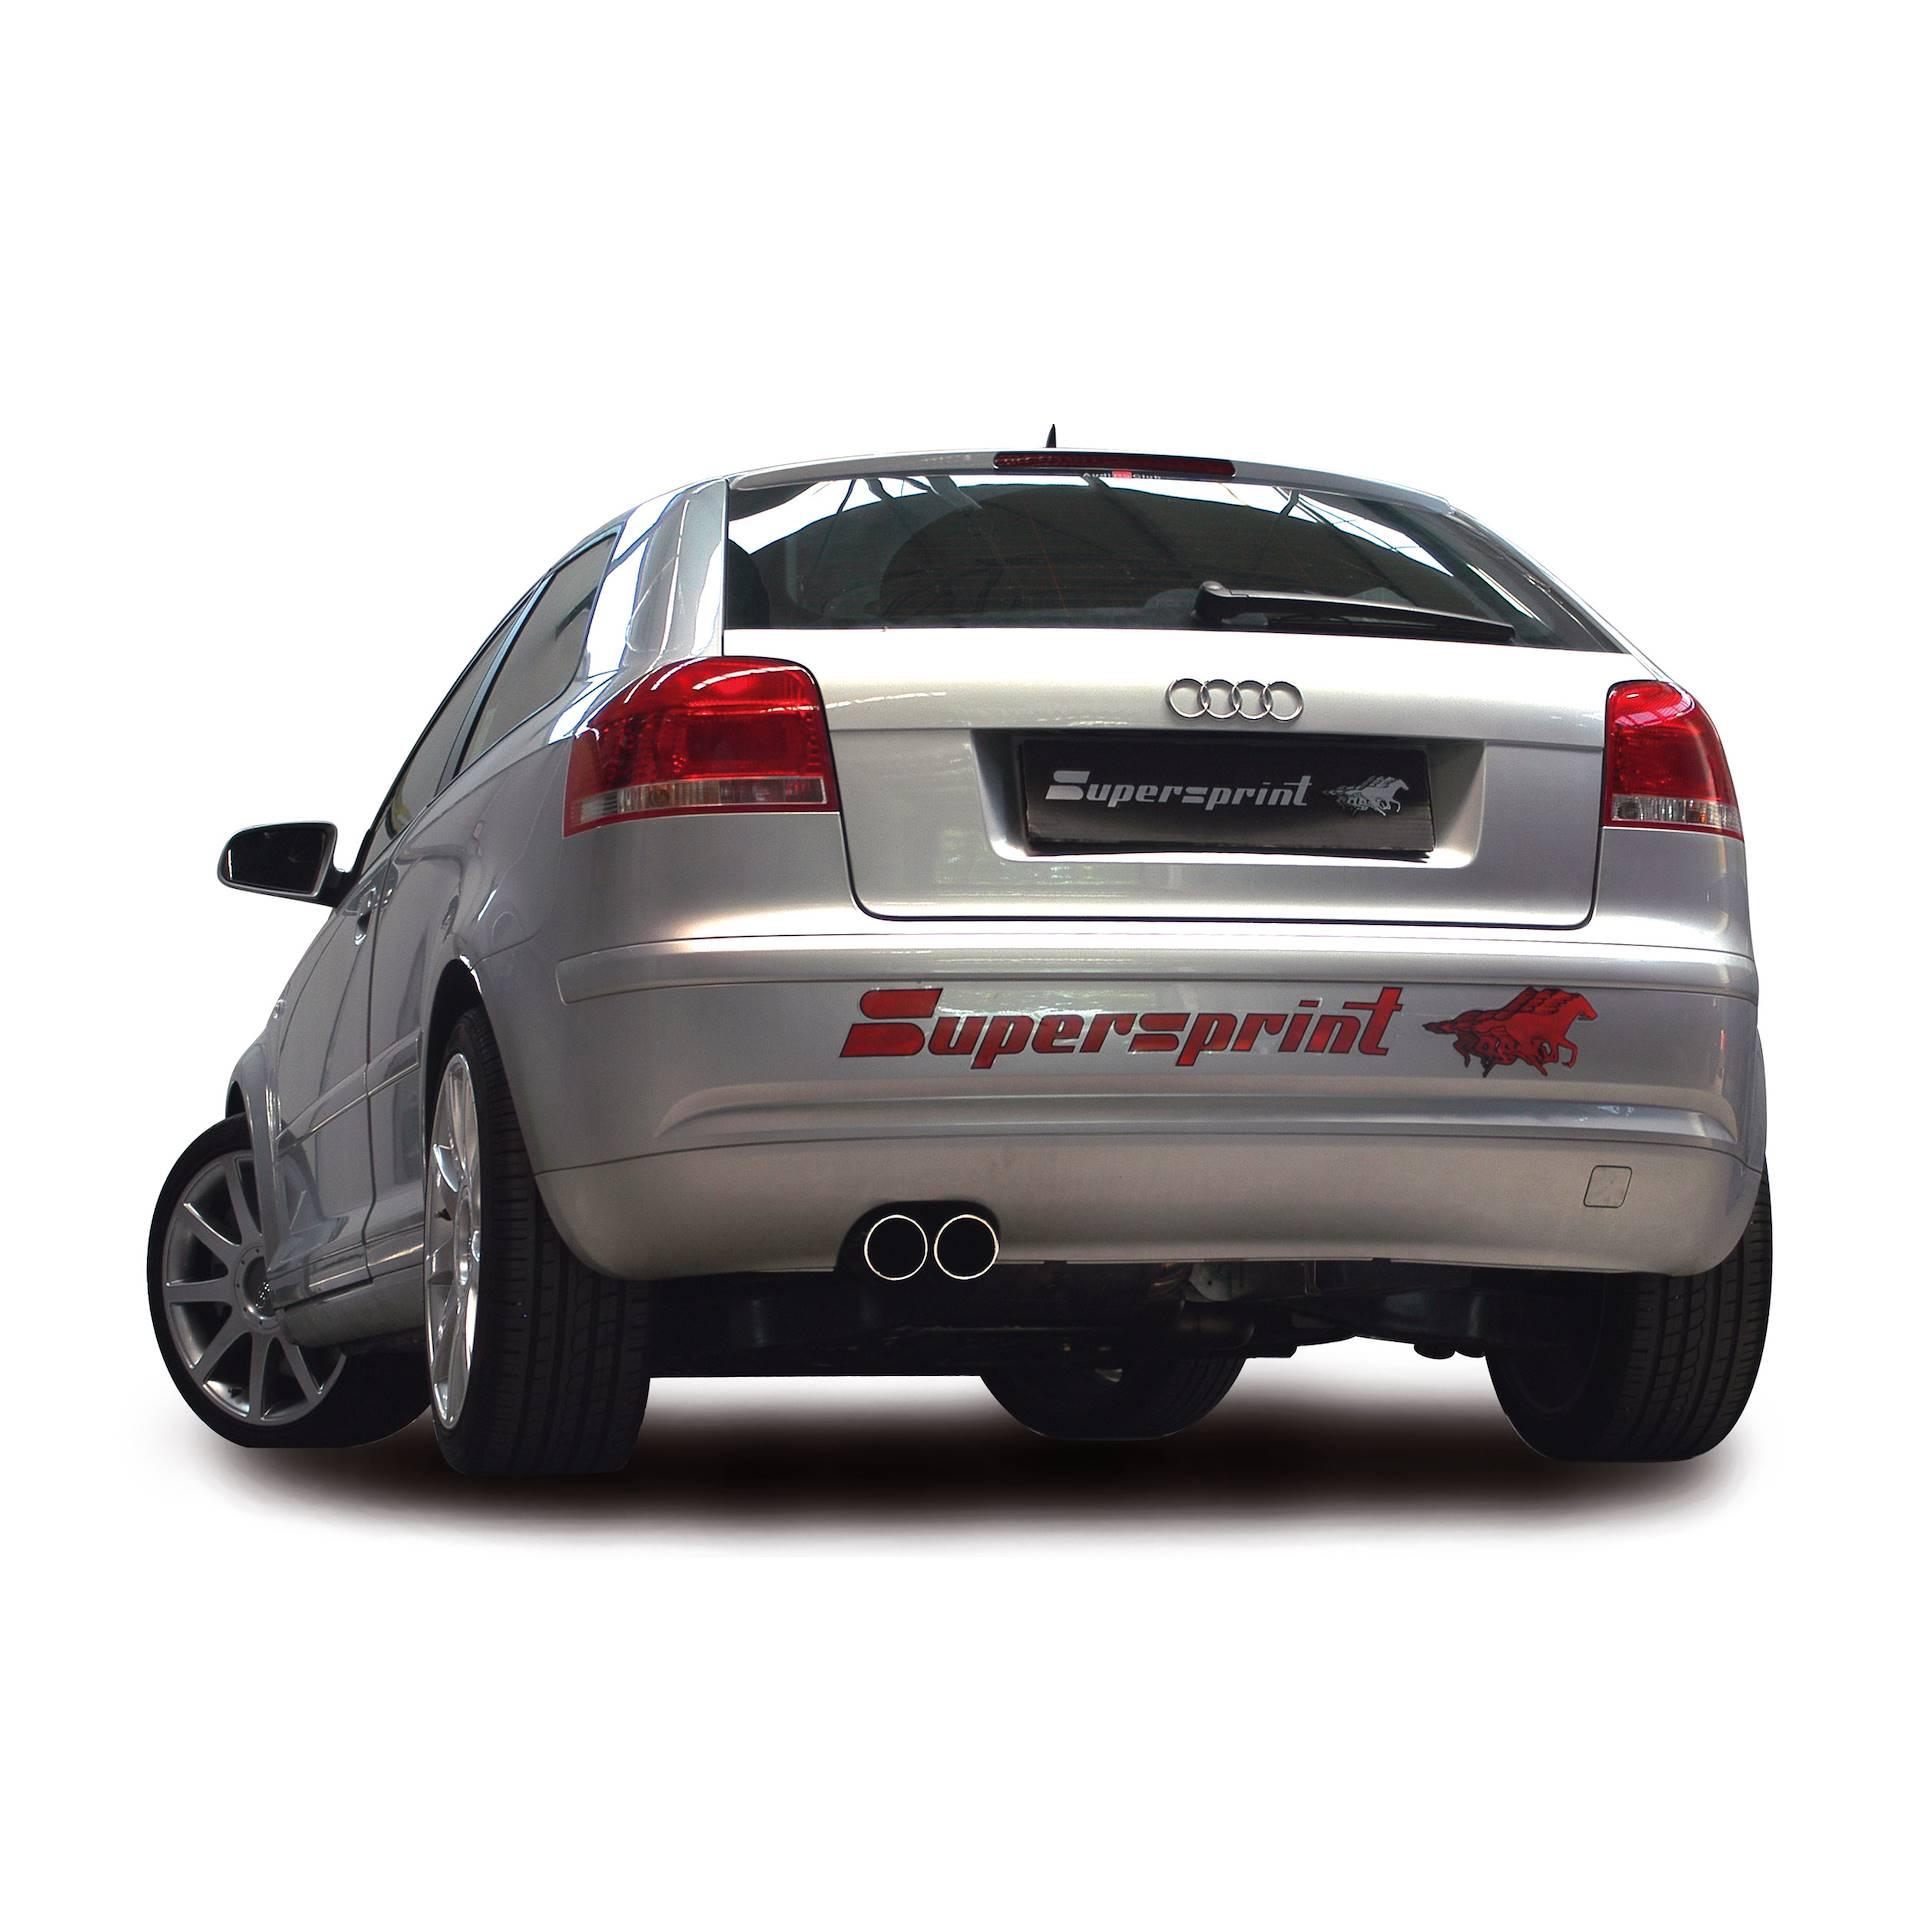 Audi A3 Quattro 3 2i Vr6 250 Hp 04 Gt Offizielle Supersprint Videos